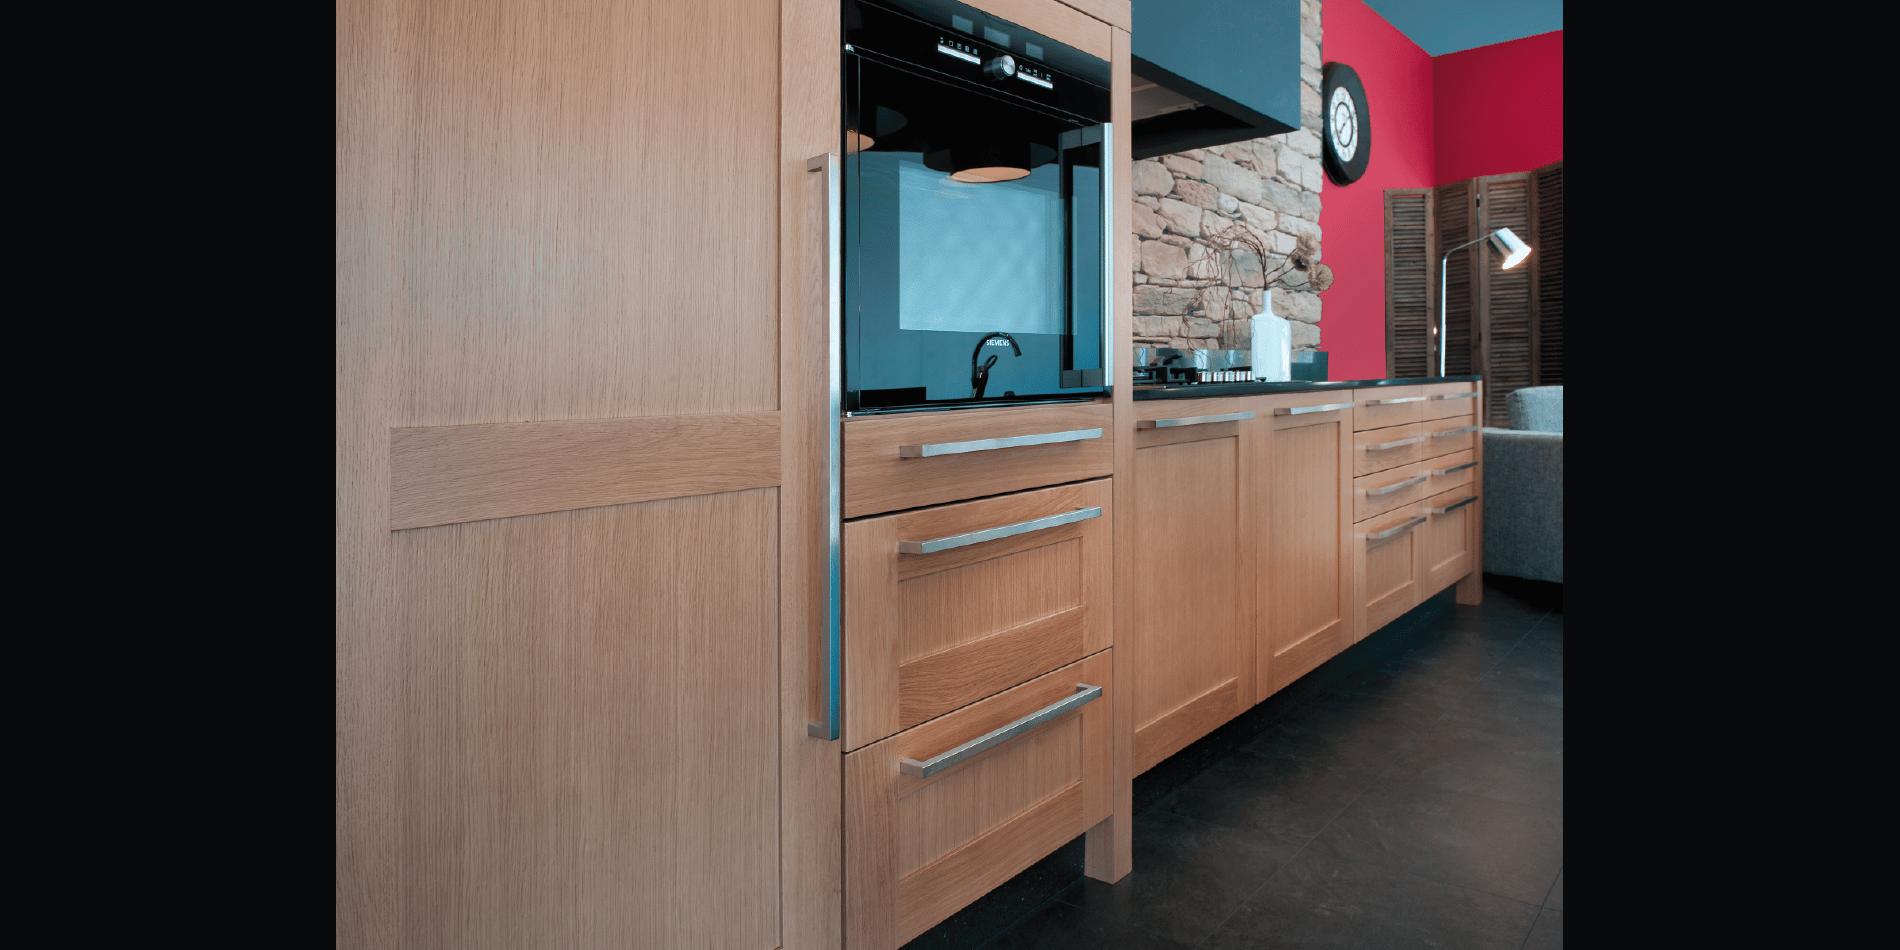 cuisine haut de gamme sur mesure trocadero marque fran aise moderne design. Black Bedroom Furniture Sets. Home Design Ideas